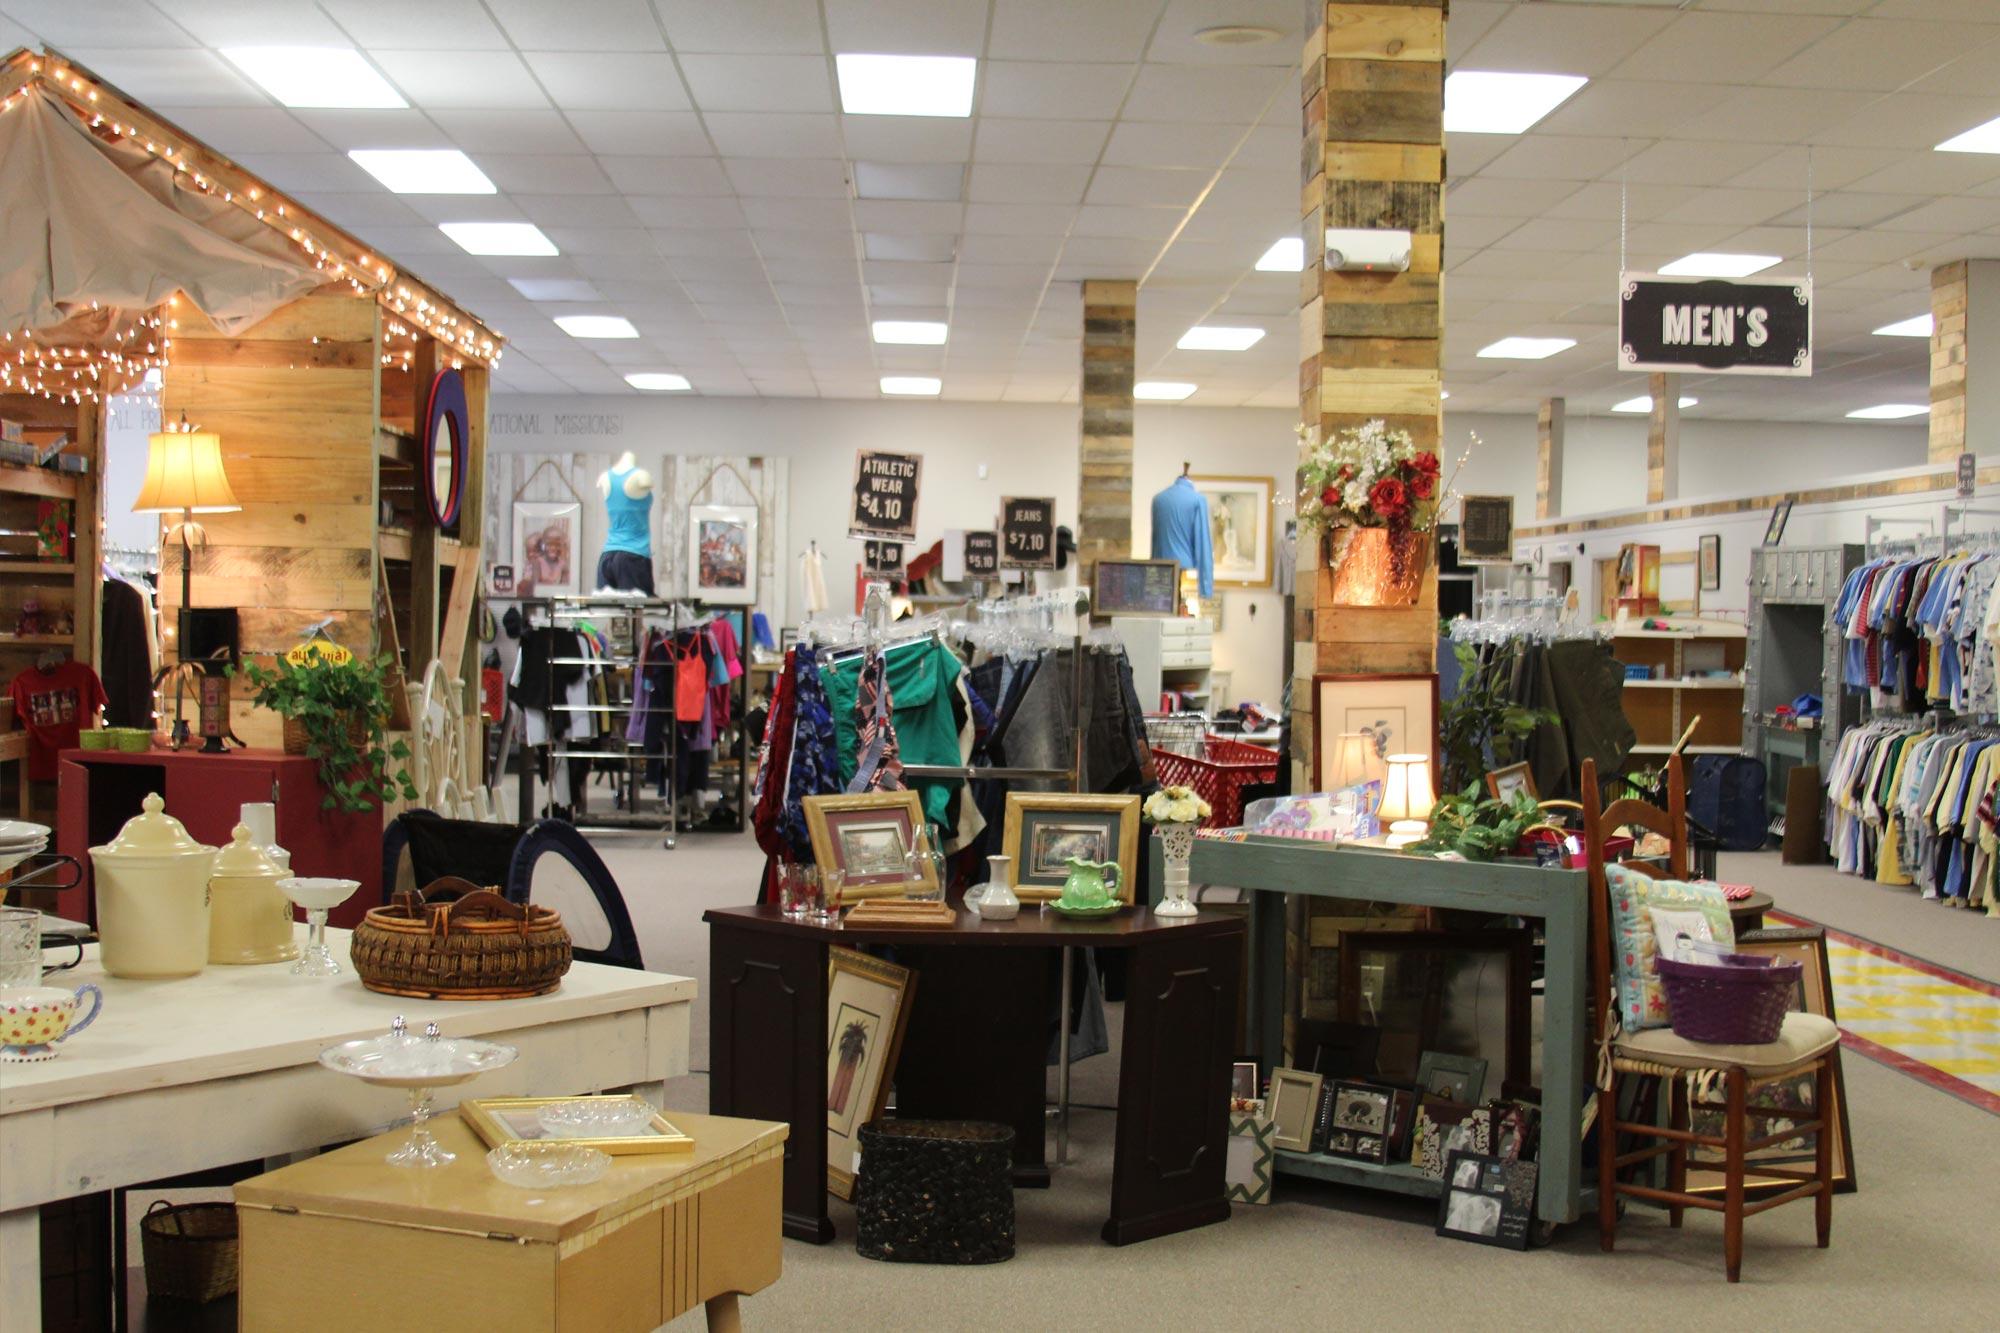 thrift_store_overview.jpg